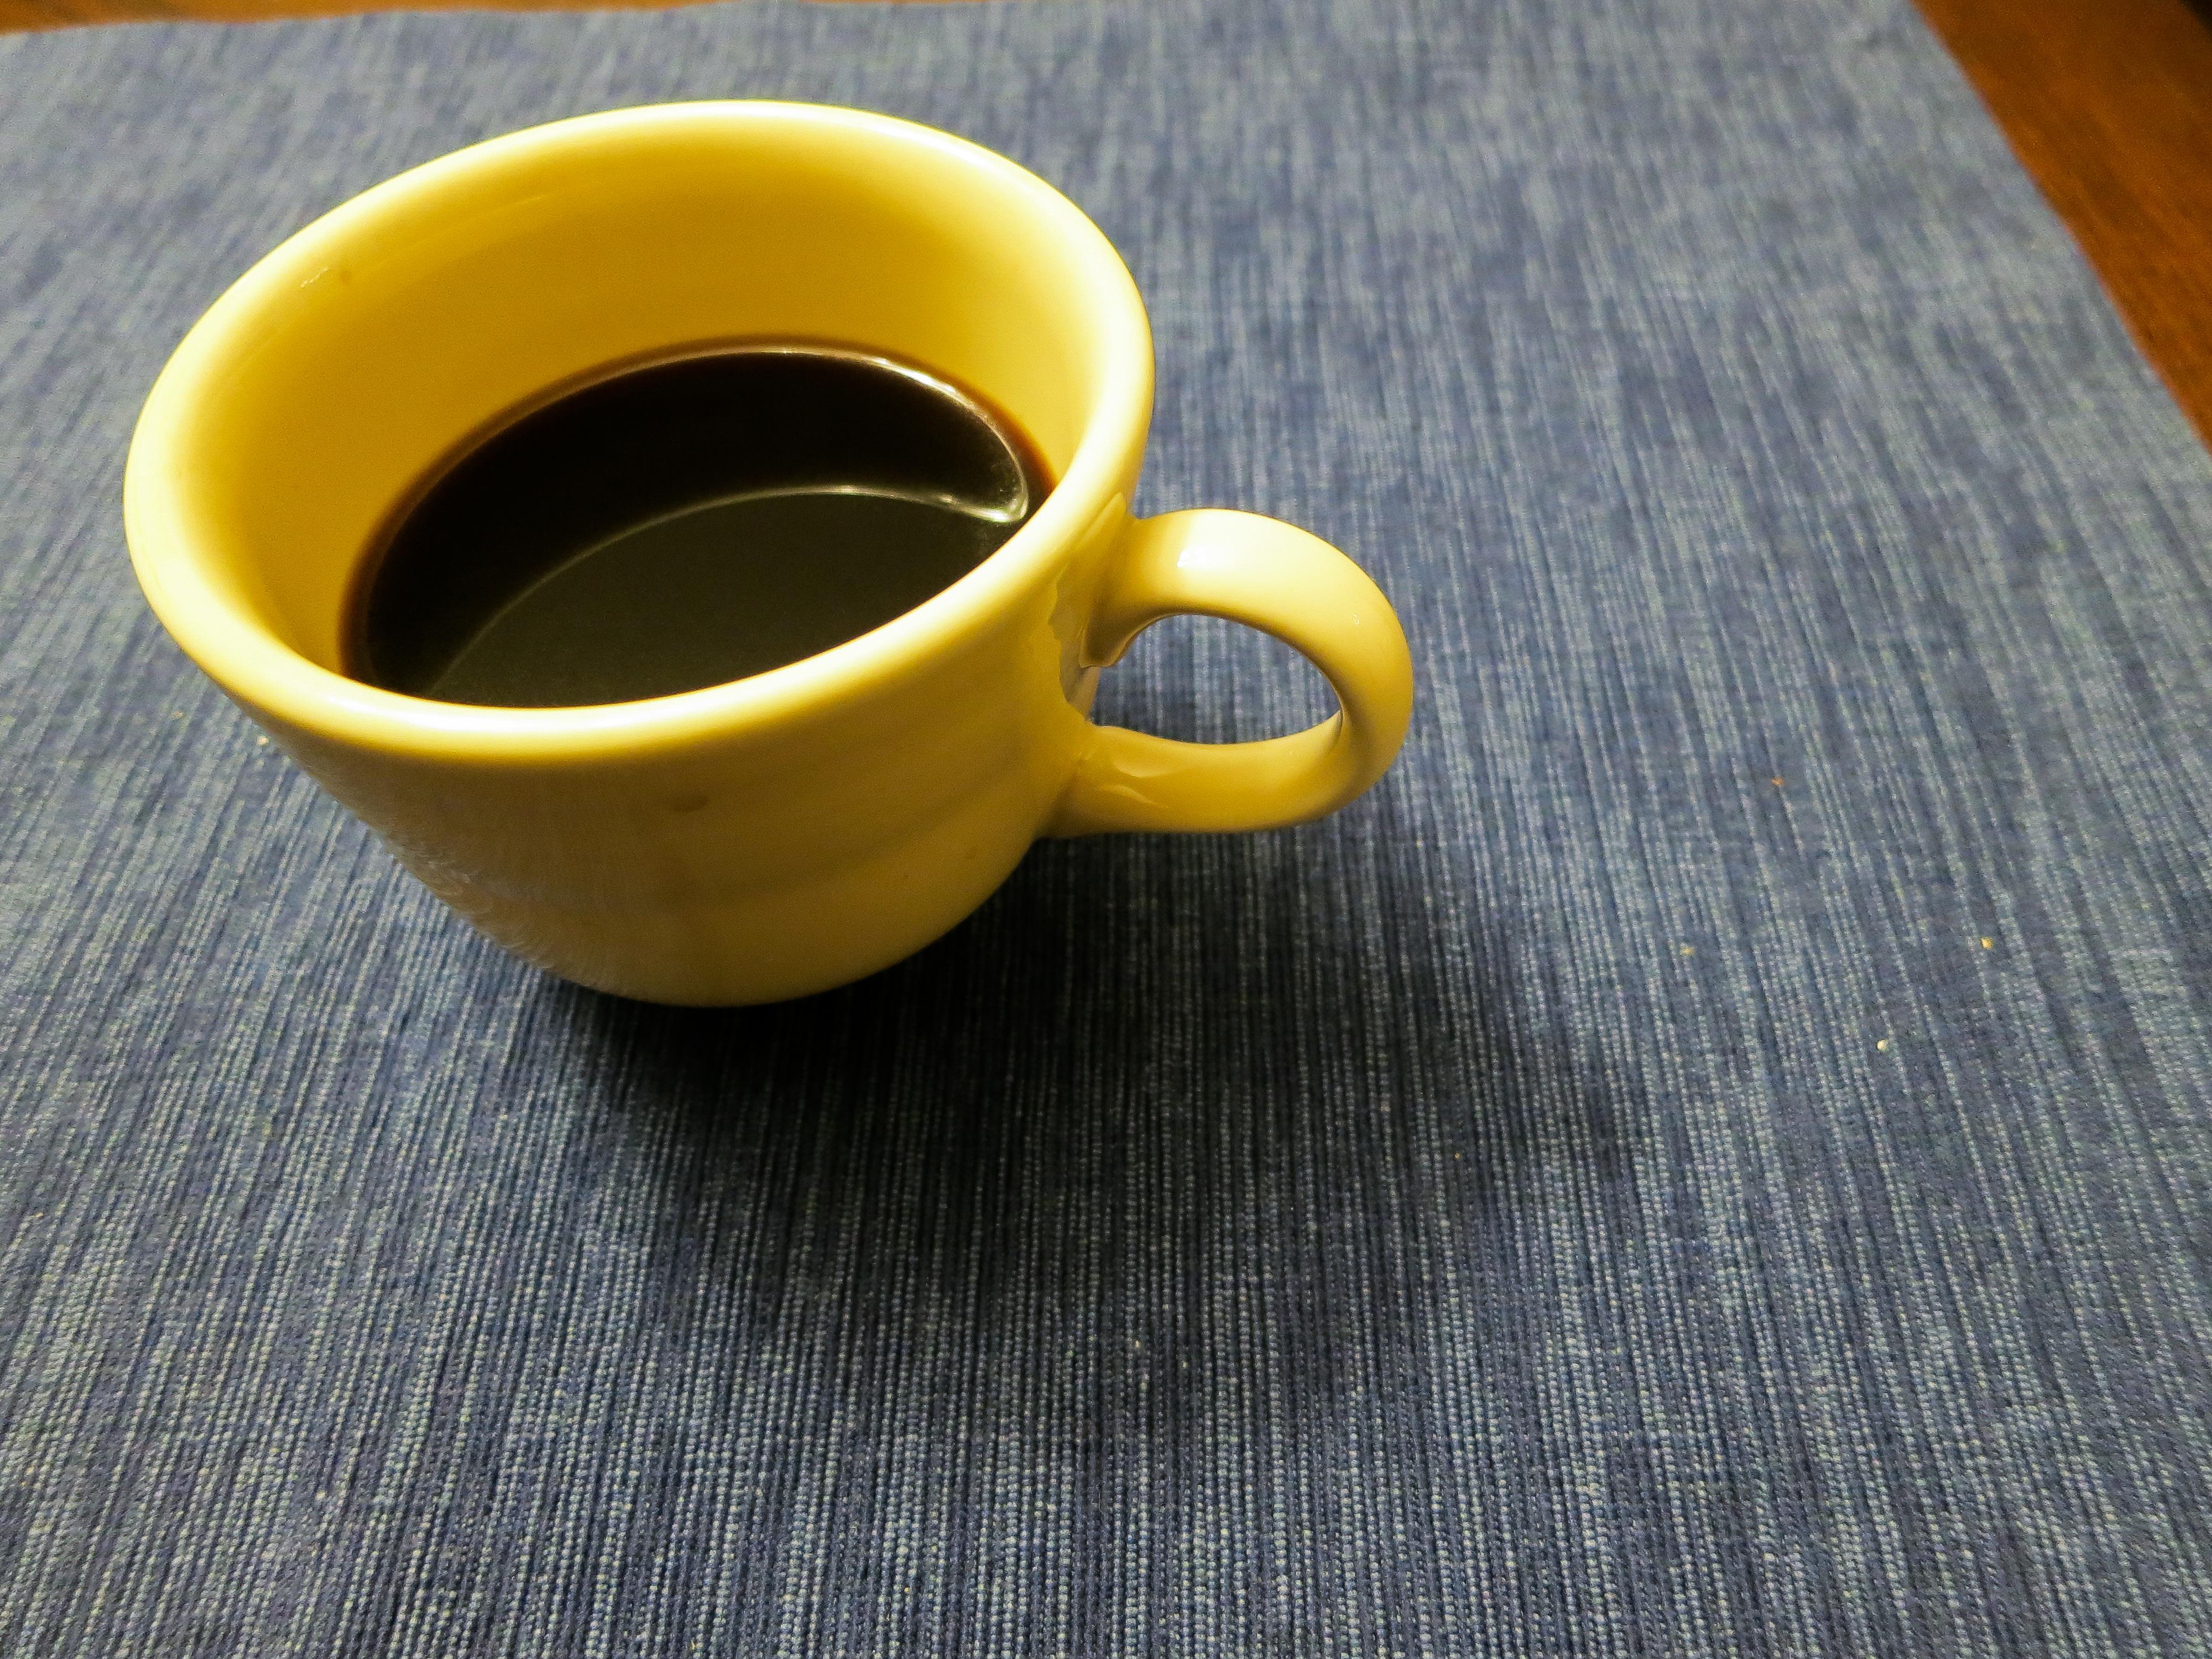 AeroPress and Gevalia Kaffee Espresso Roast